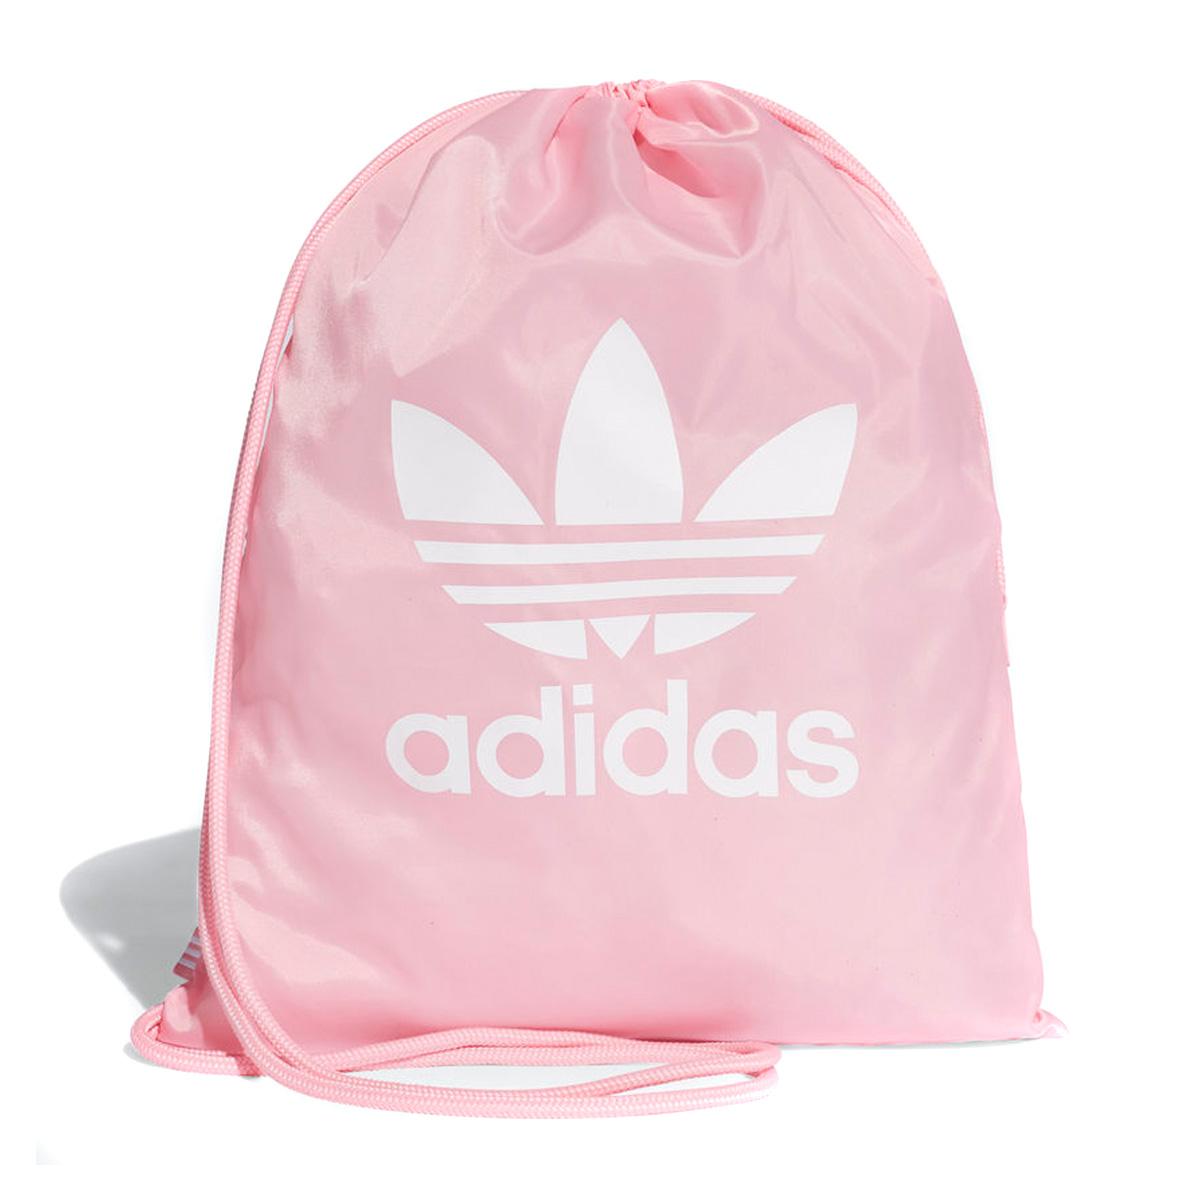 adidas Originals GYMSACK TREFOIL (アディダスオリジナルスジムサックトレフォイル) Light Pink 18FW-I